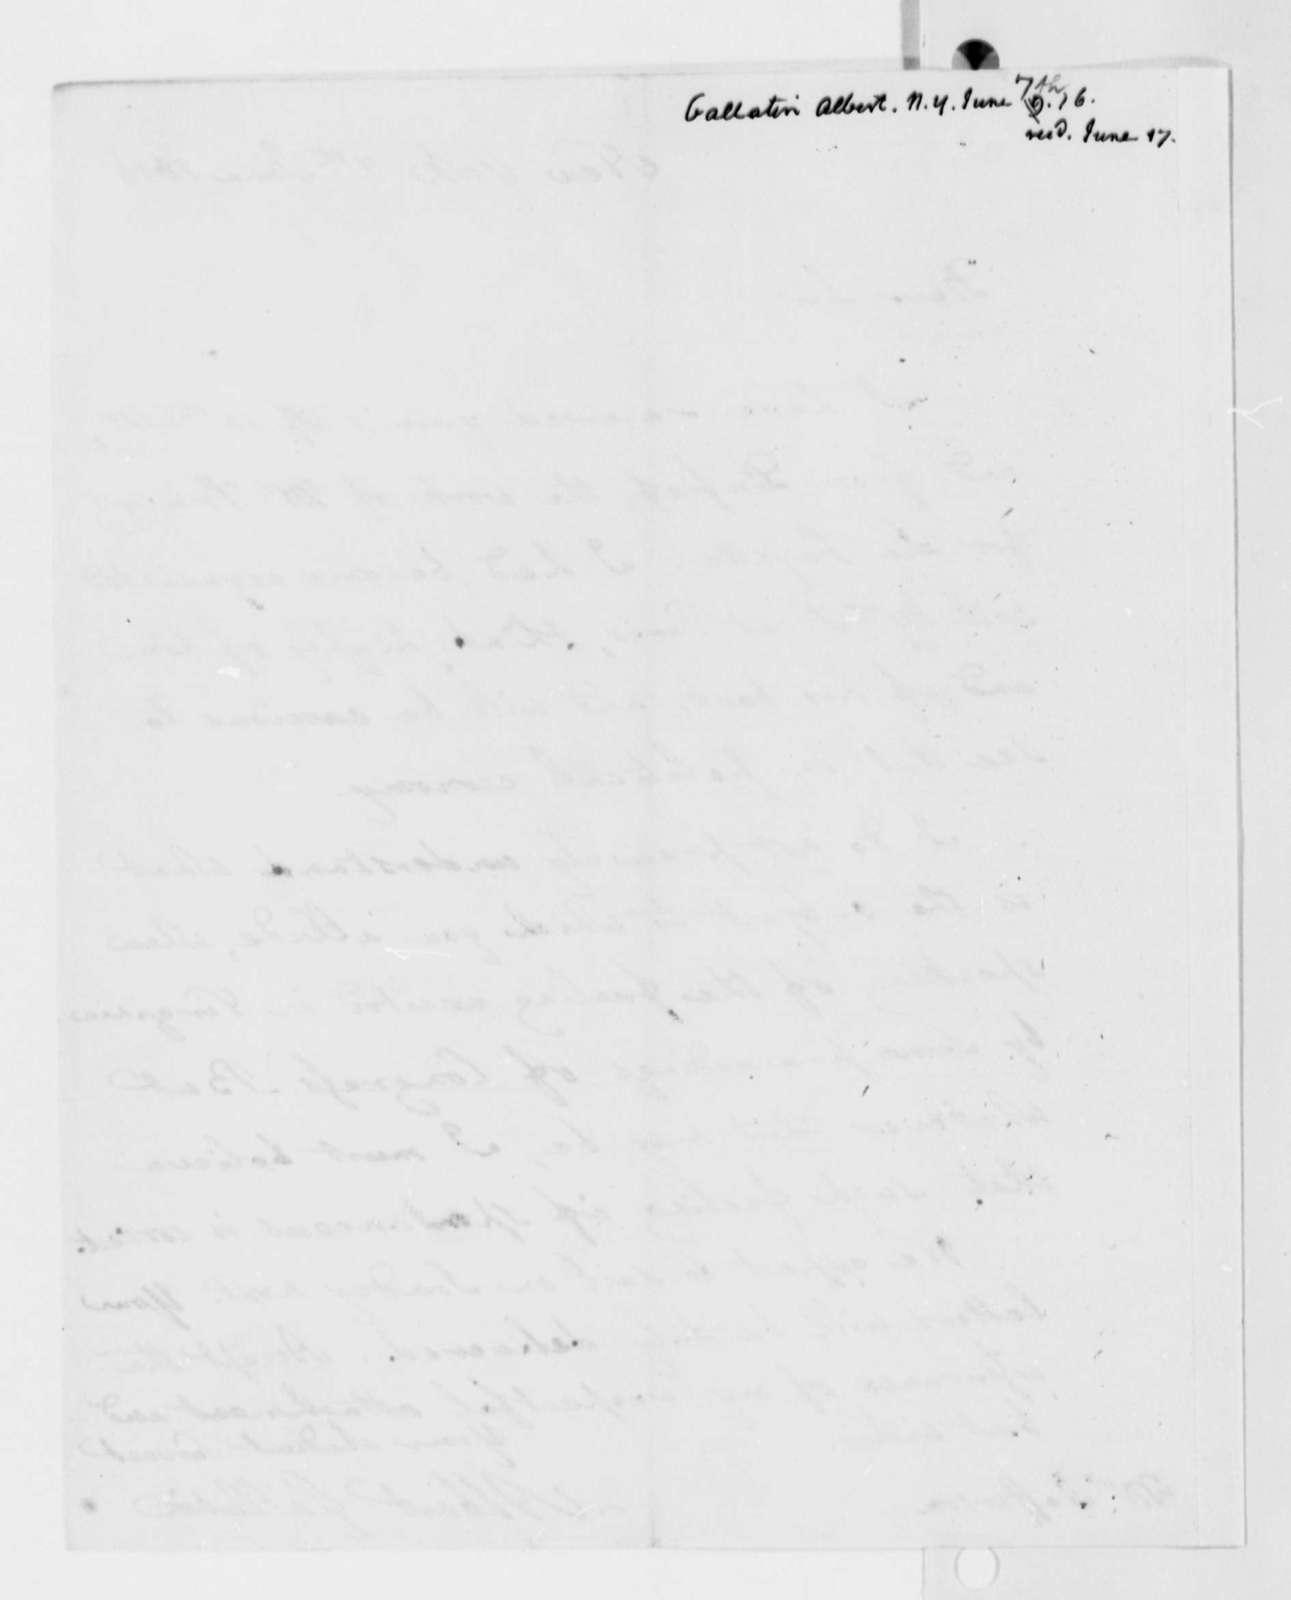 Albert Gallatin to Thomas Jefferson, June 7, 1816